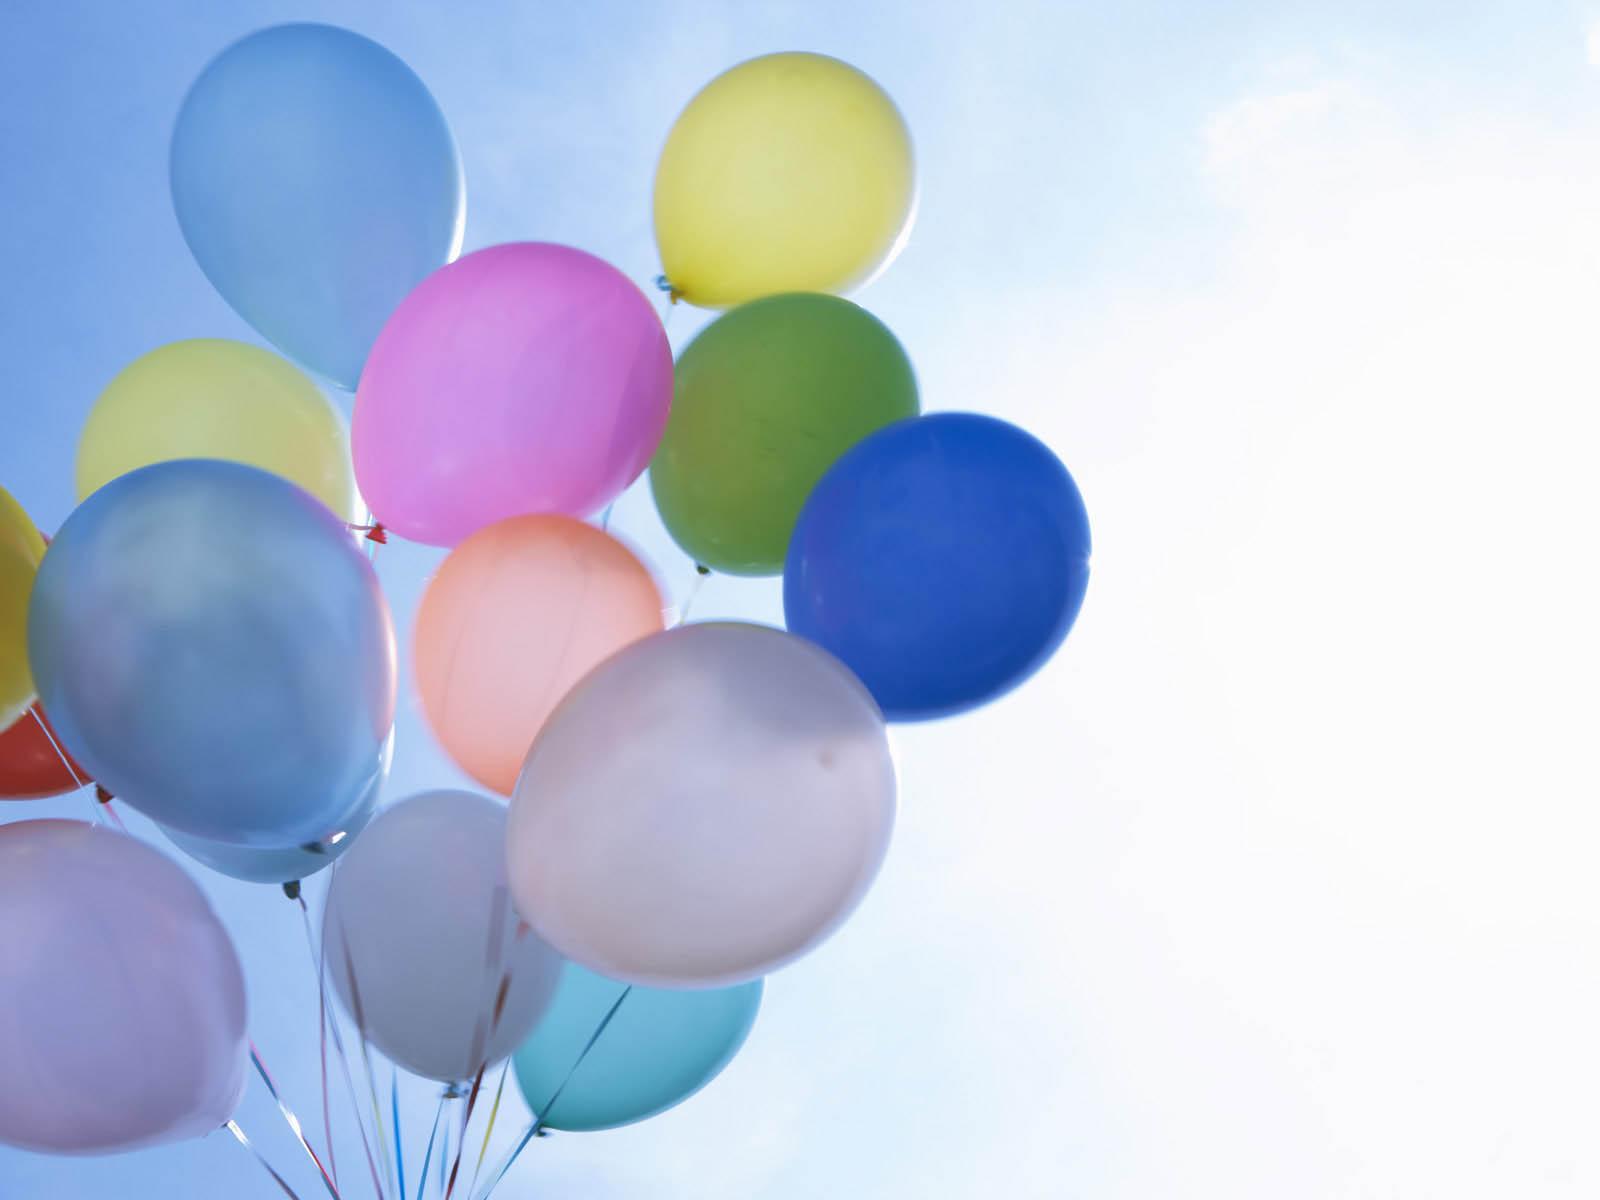 Love Wallpaper GambarGambar Balon Udara Yang Cantik 1600x1200